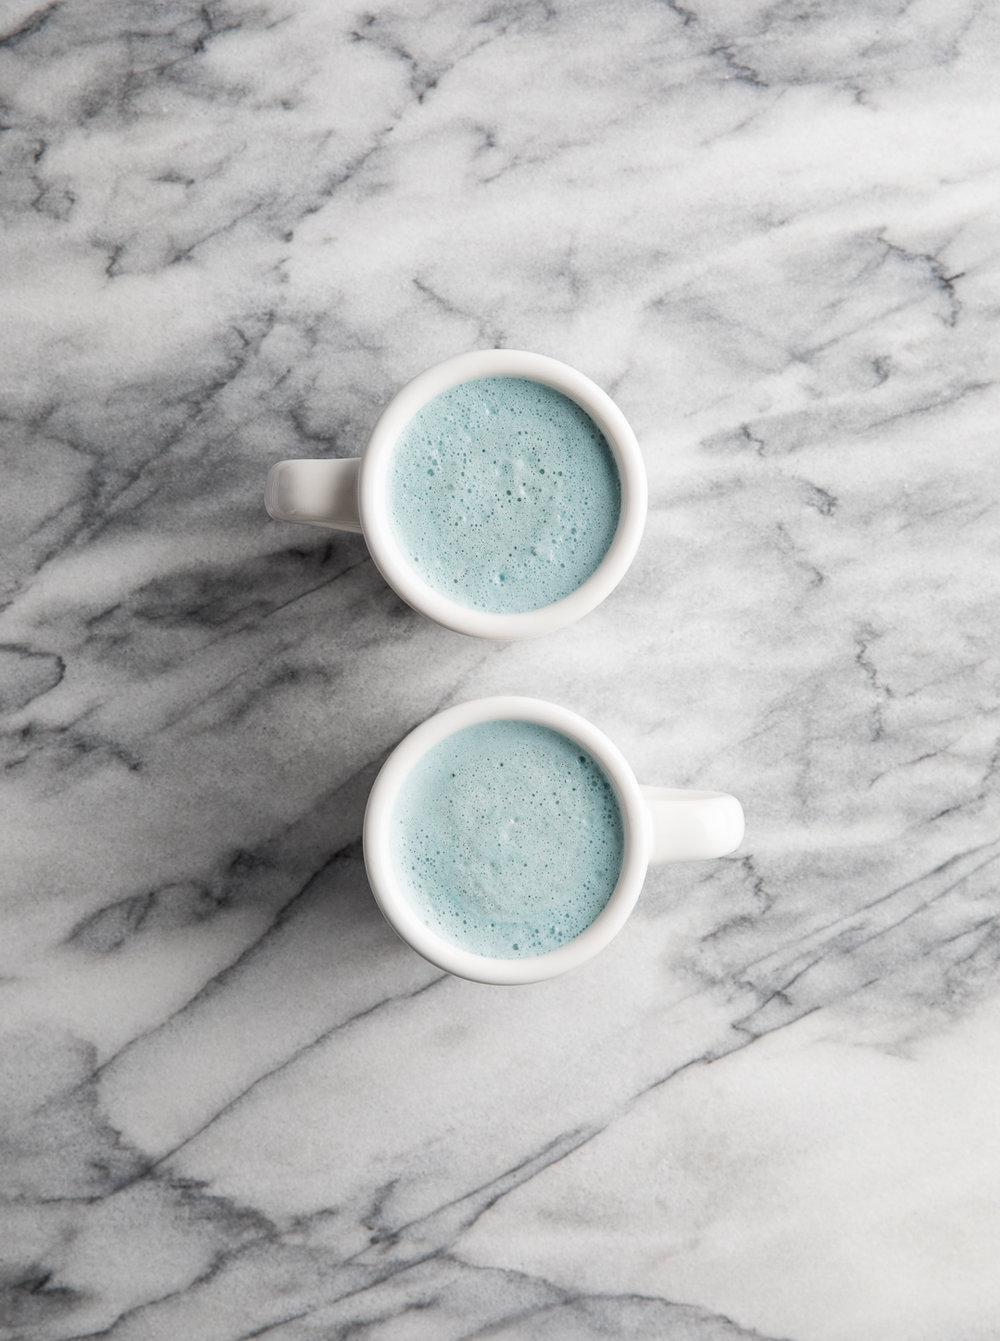 Blue mood latte